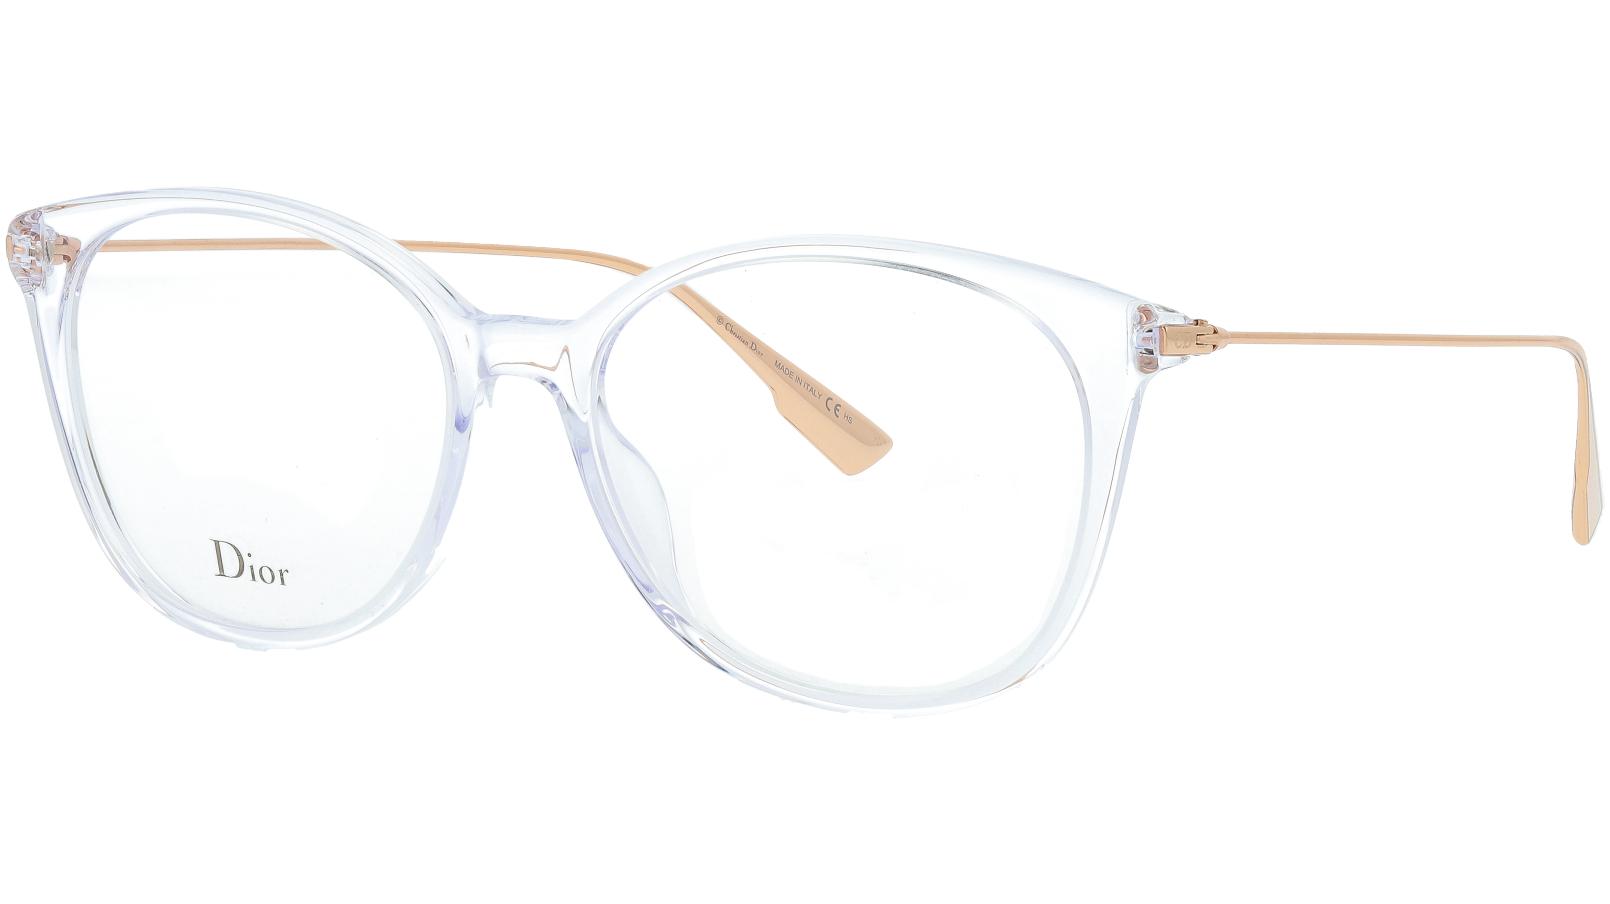 Dior SIGHTO1 900 52 Crystal Glasses